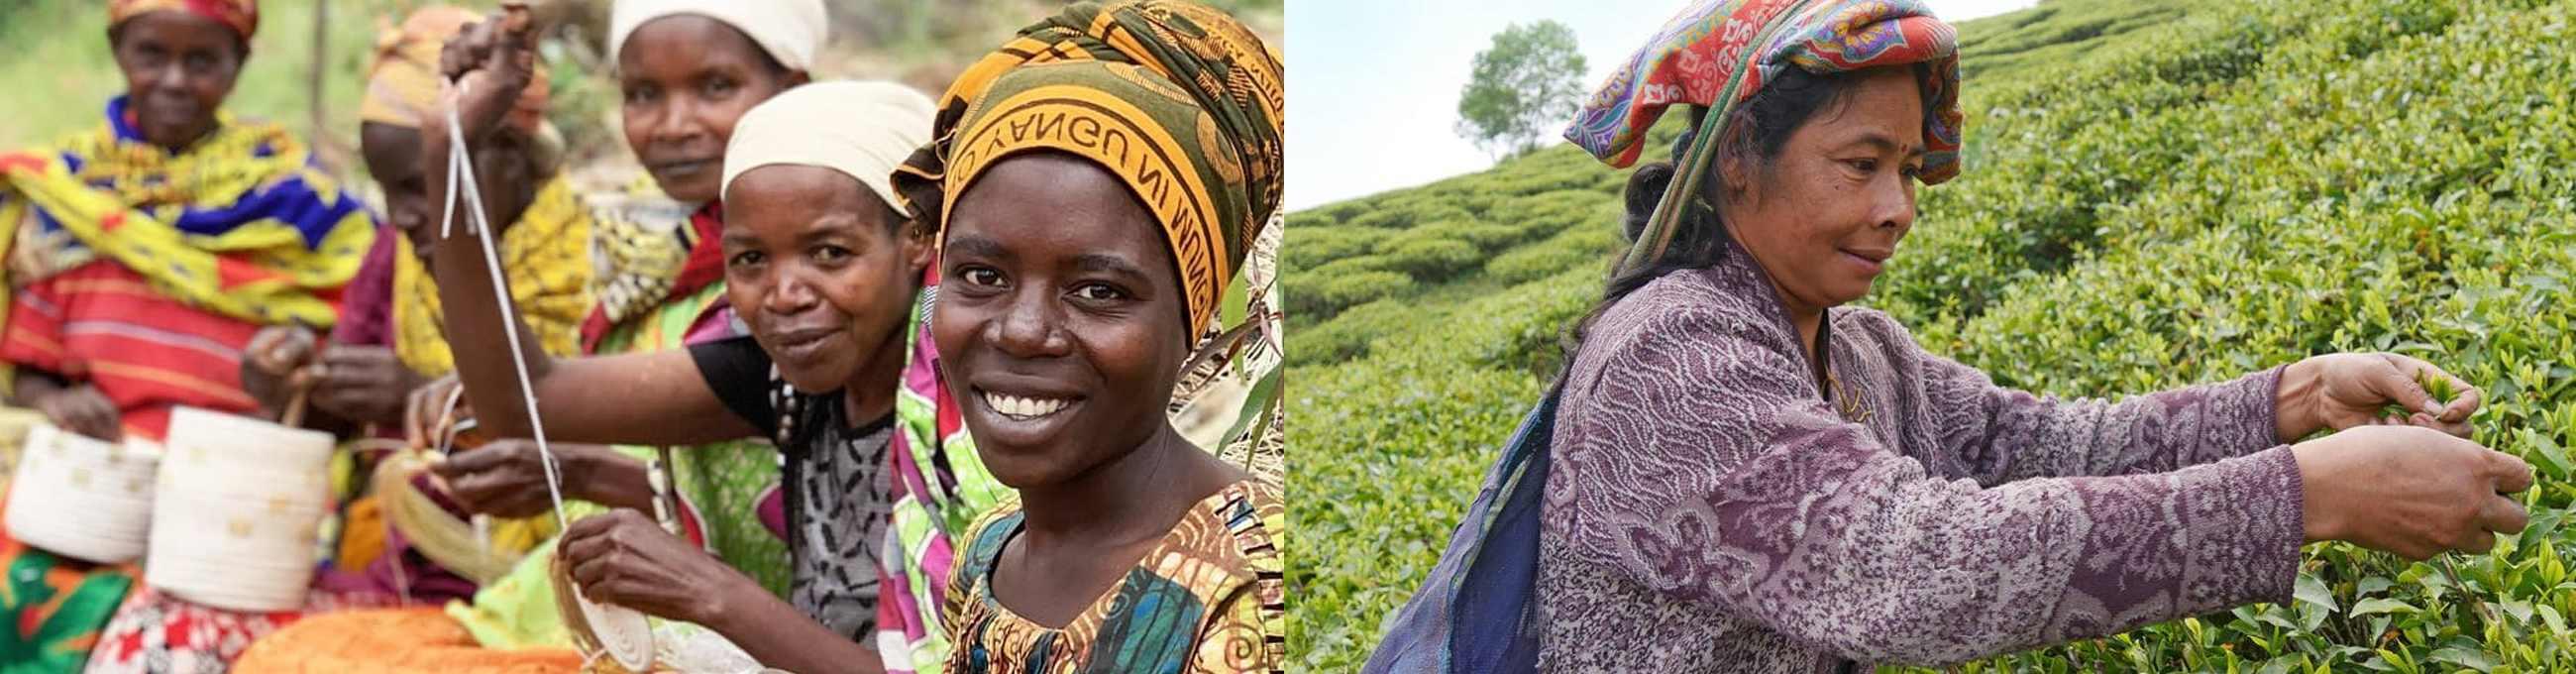 Human Rights Day - Fair Trade  enterprise